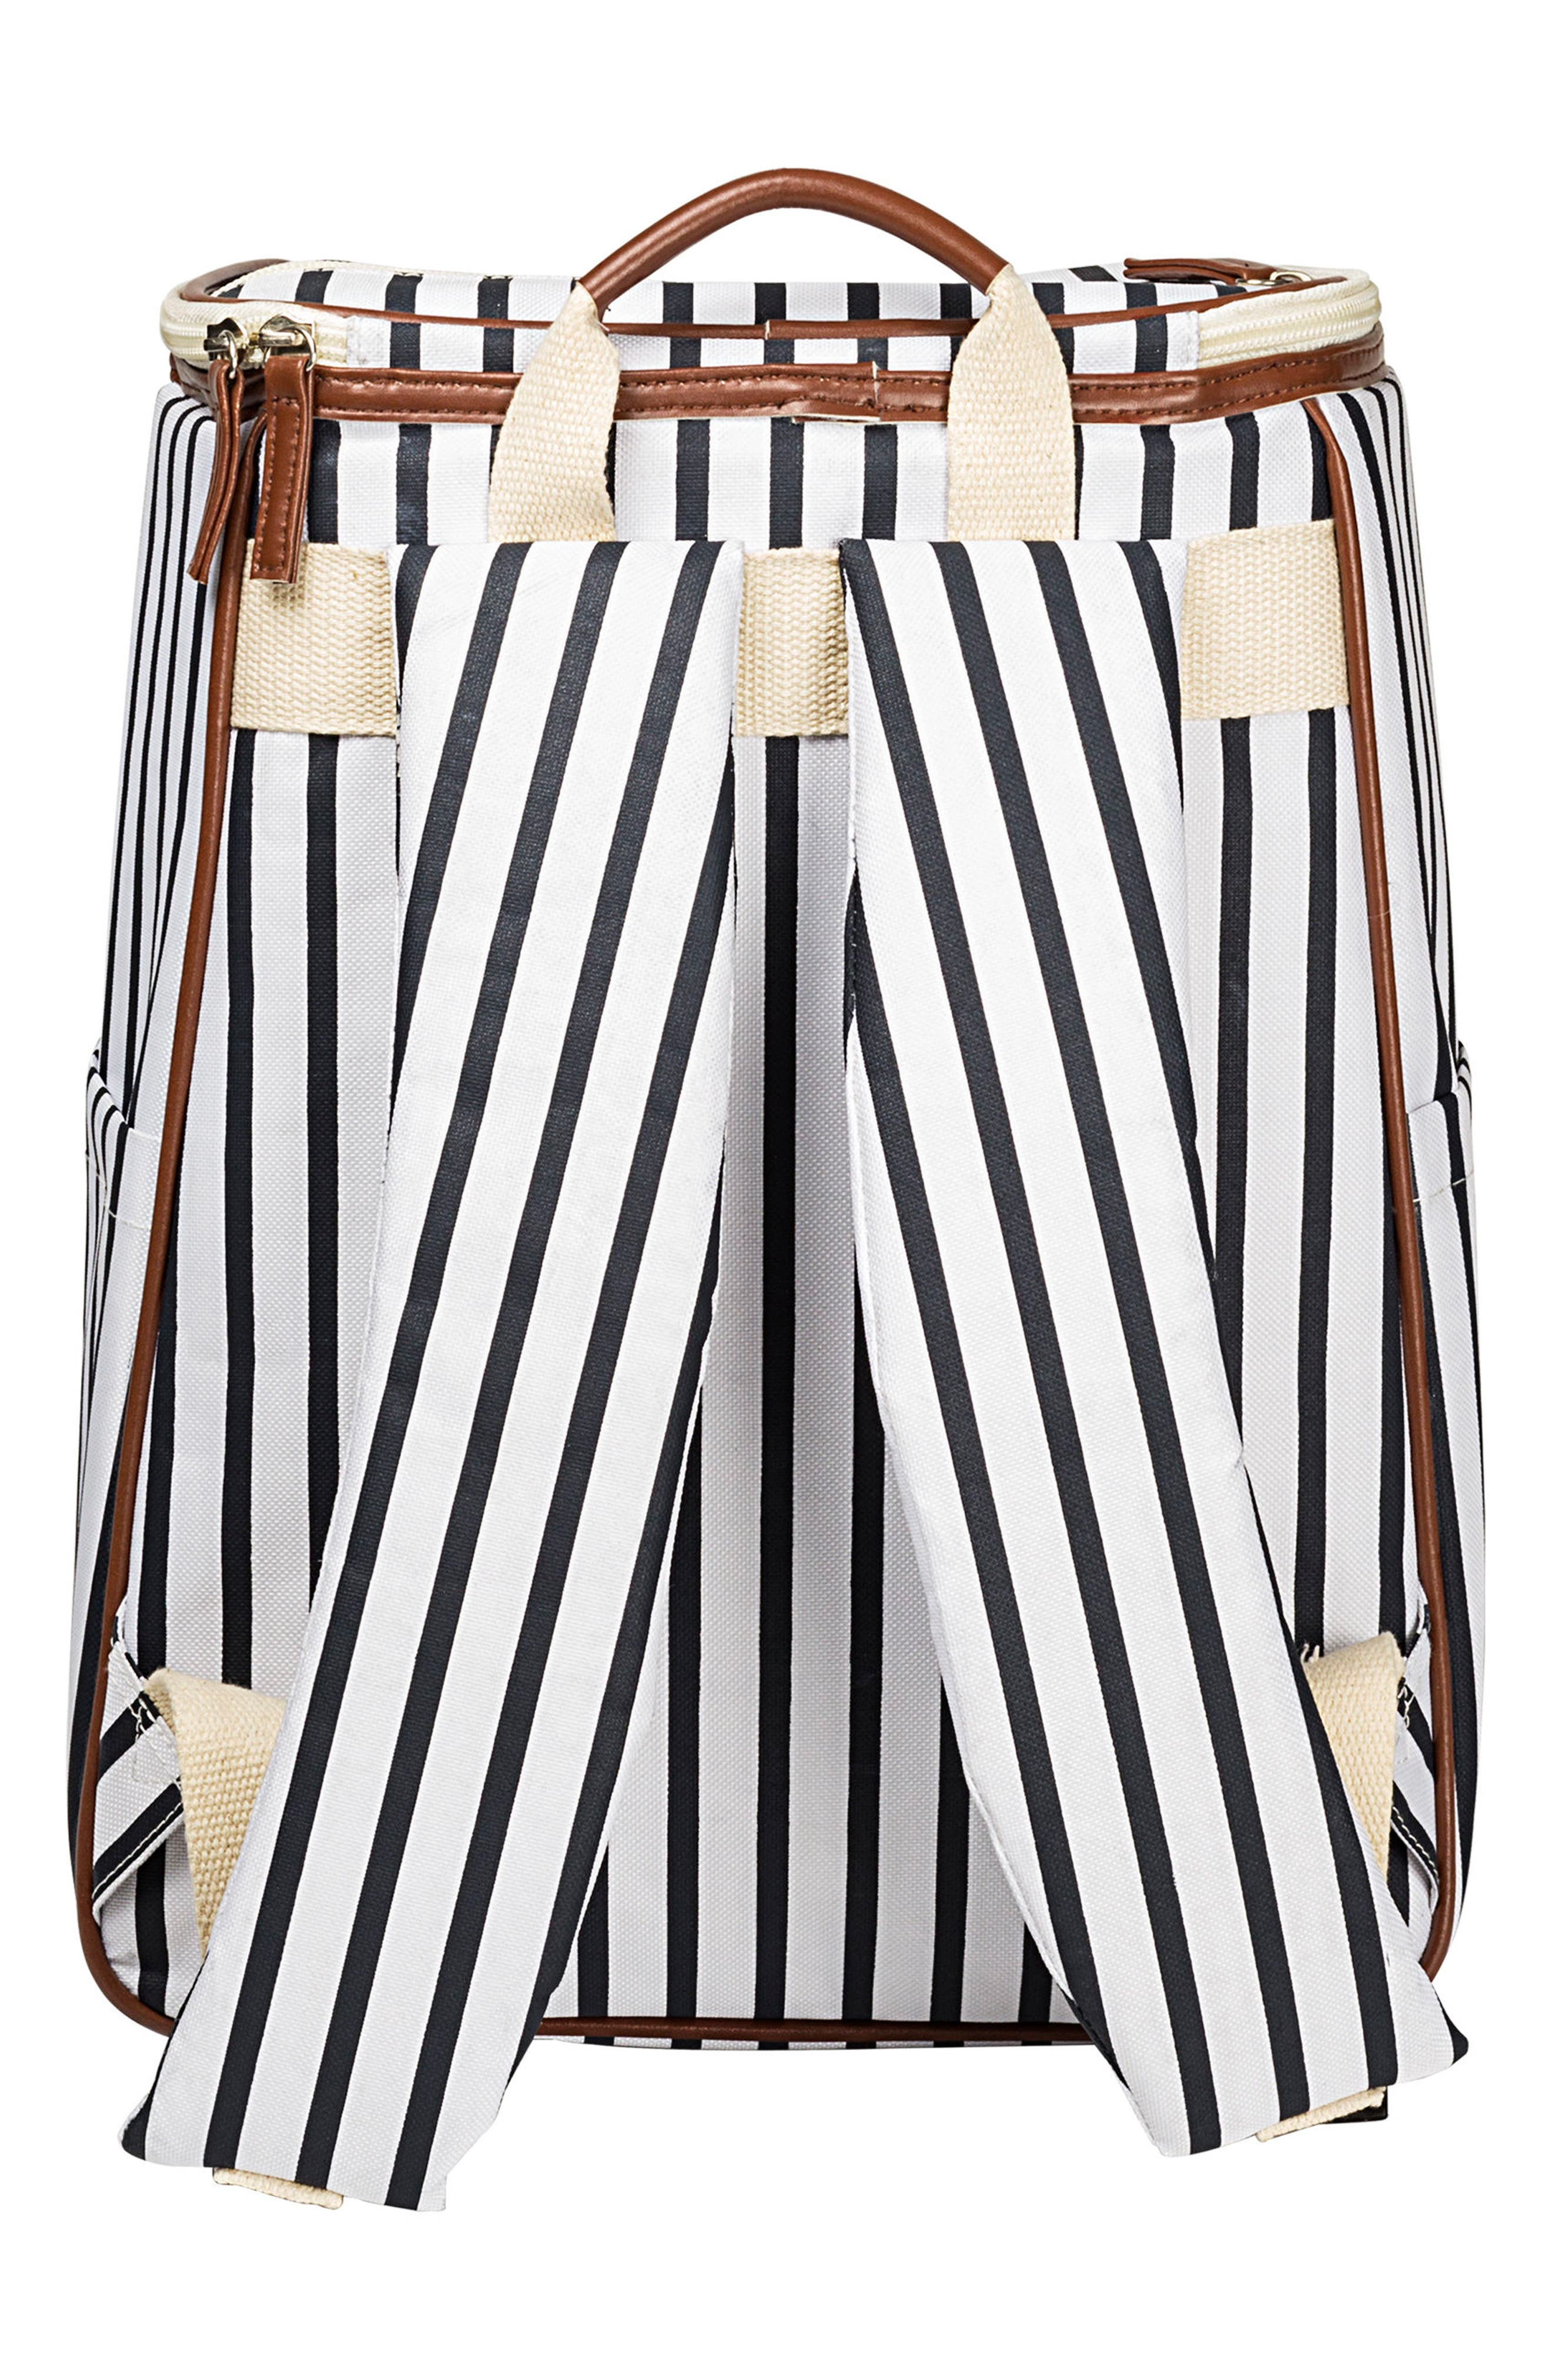 Monogram Stripe Backpack Cooler,                             Alternate thumbnail 2, color,                             BLUE